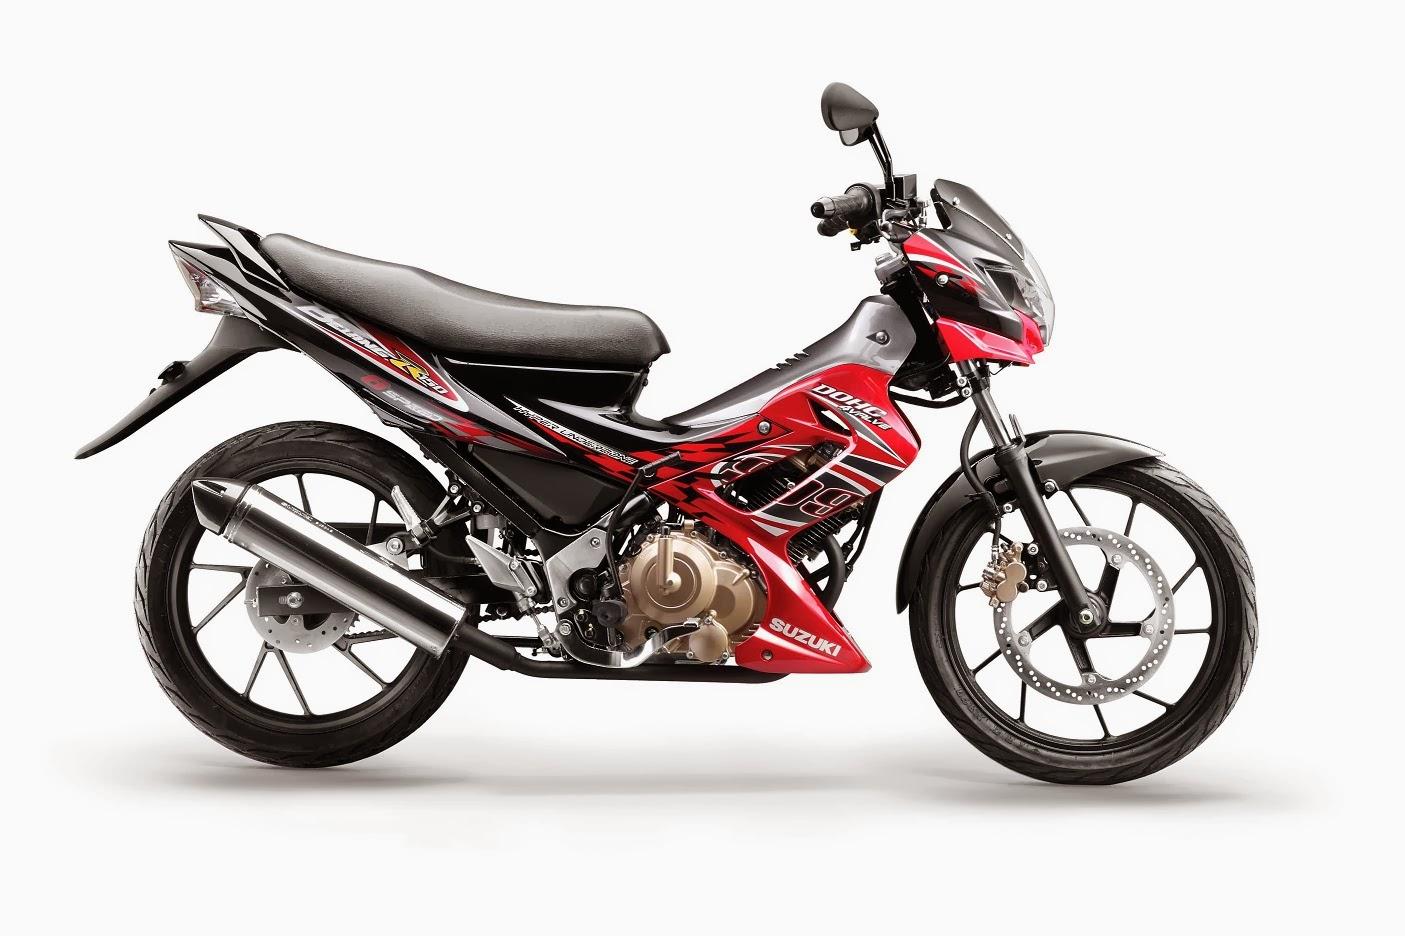 Satria Fu 150cc Vs New Honda Sonic 125cc